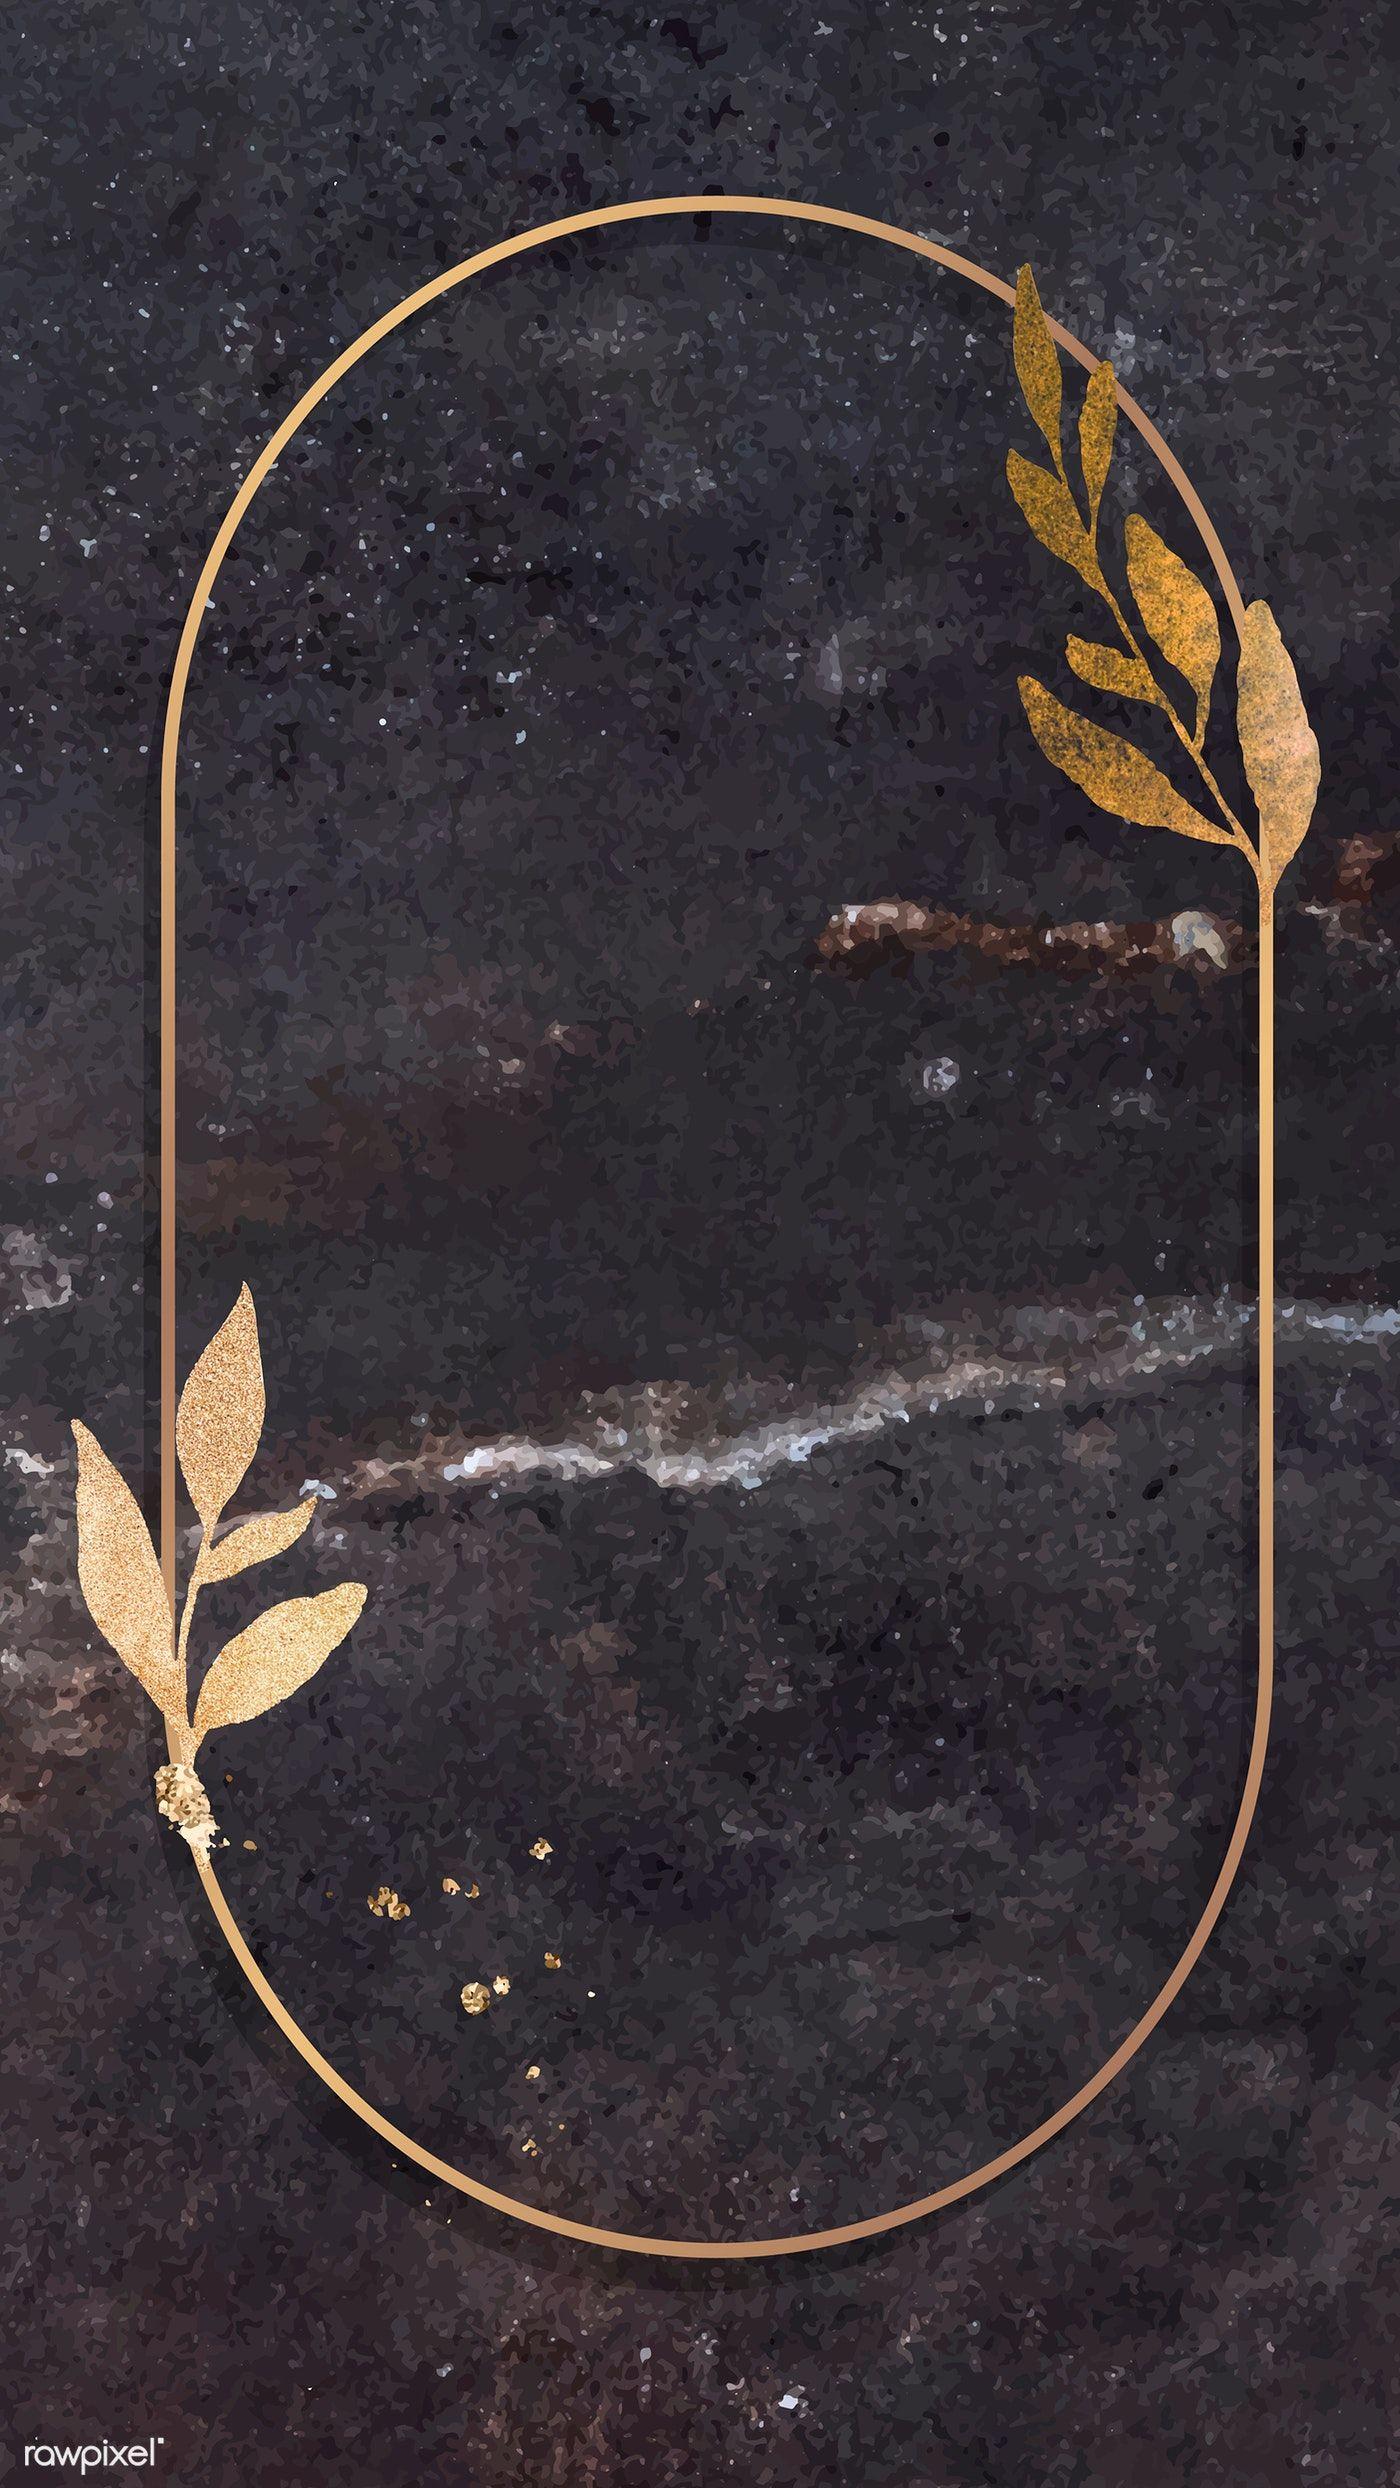 Download Premium Vector Of Christmas Golden Oval Frame On Black Marble Black Marble Background Marble Background Black Marble